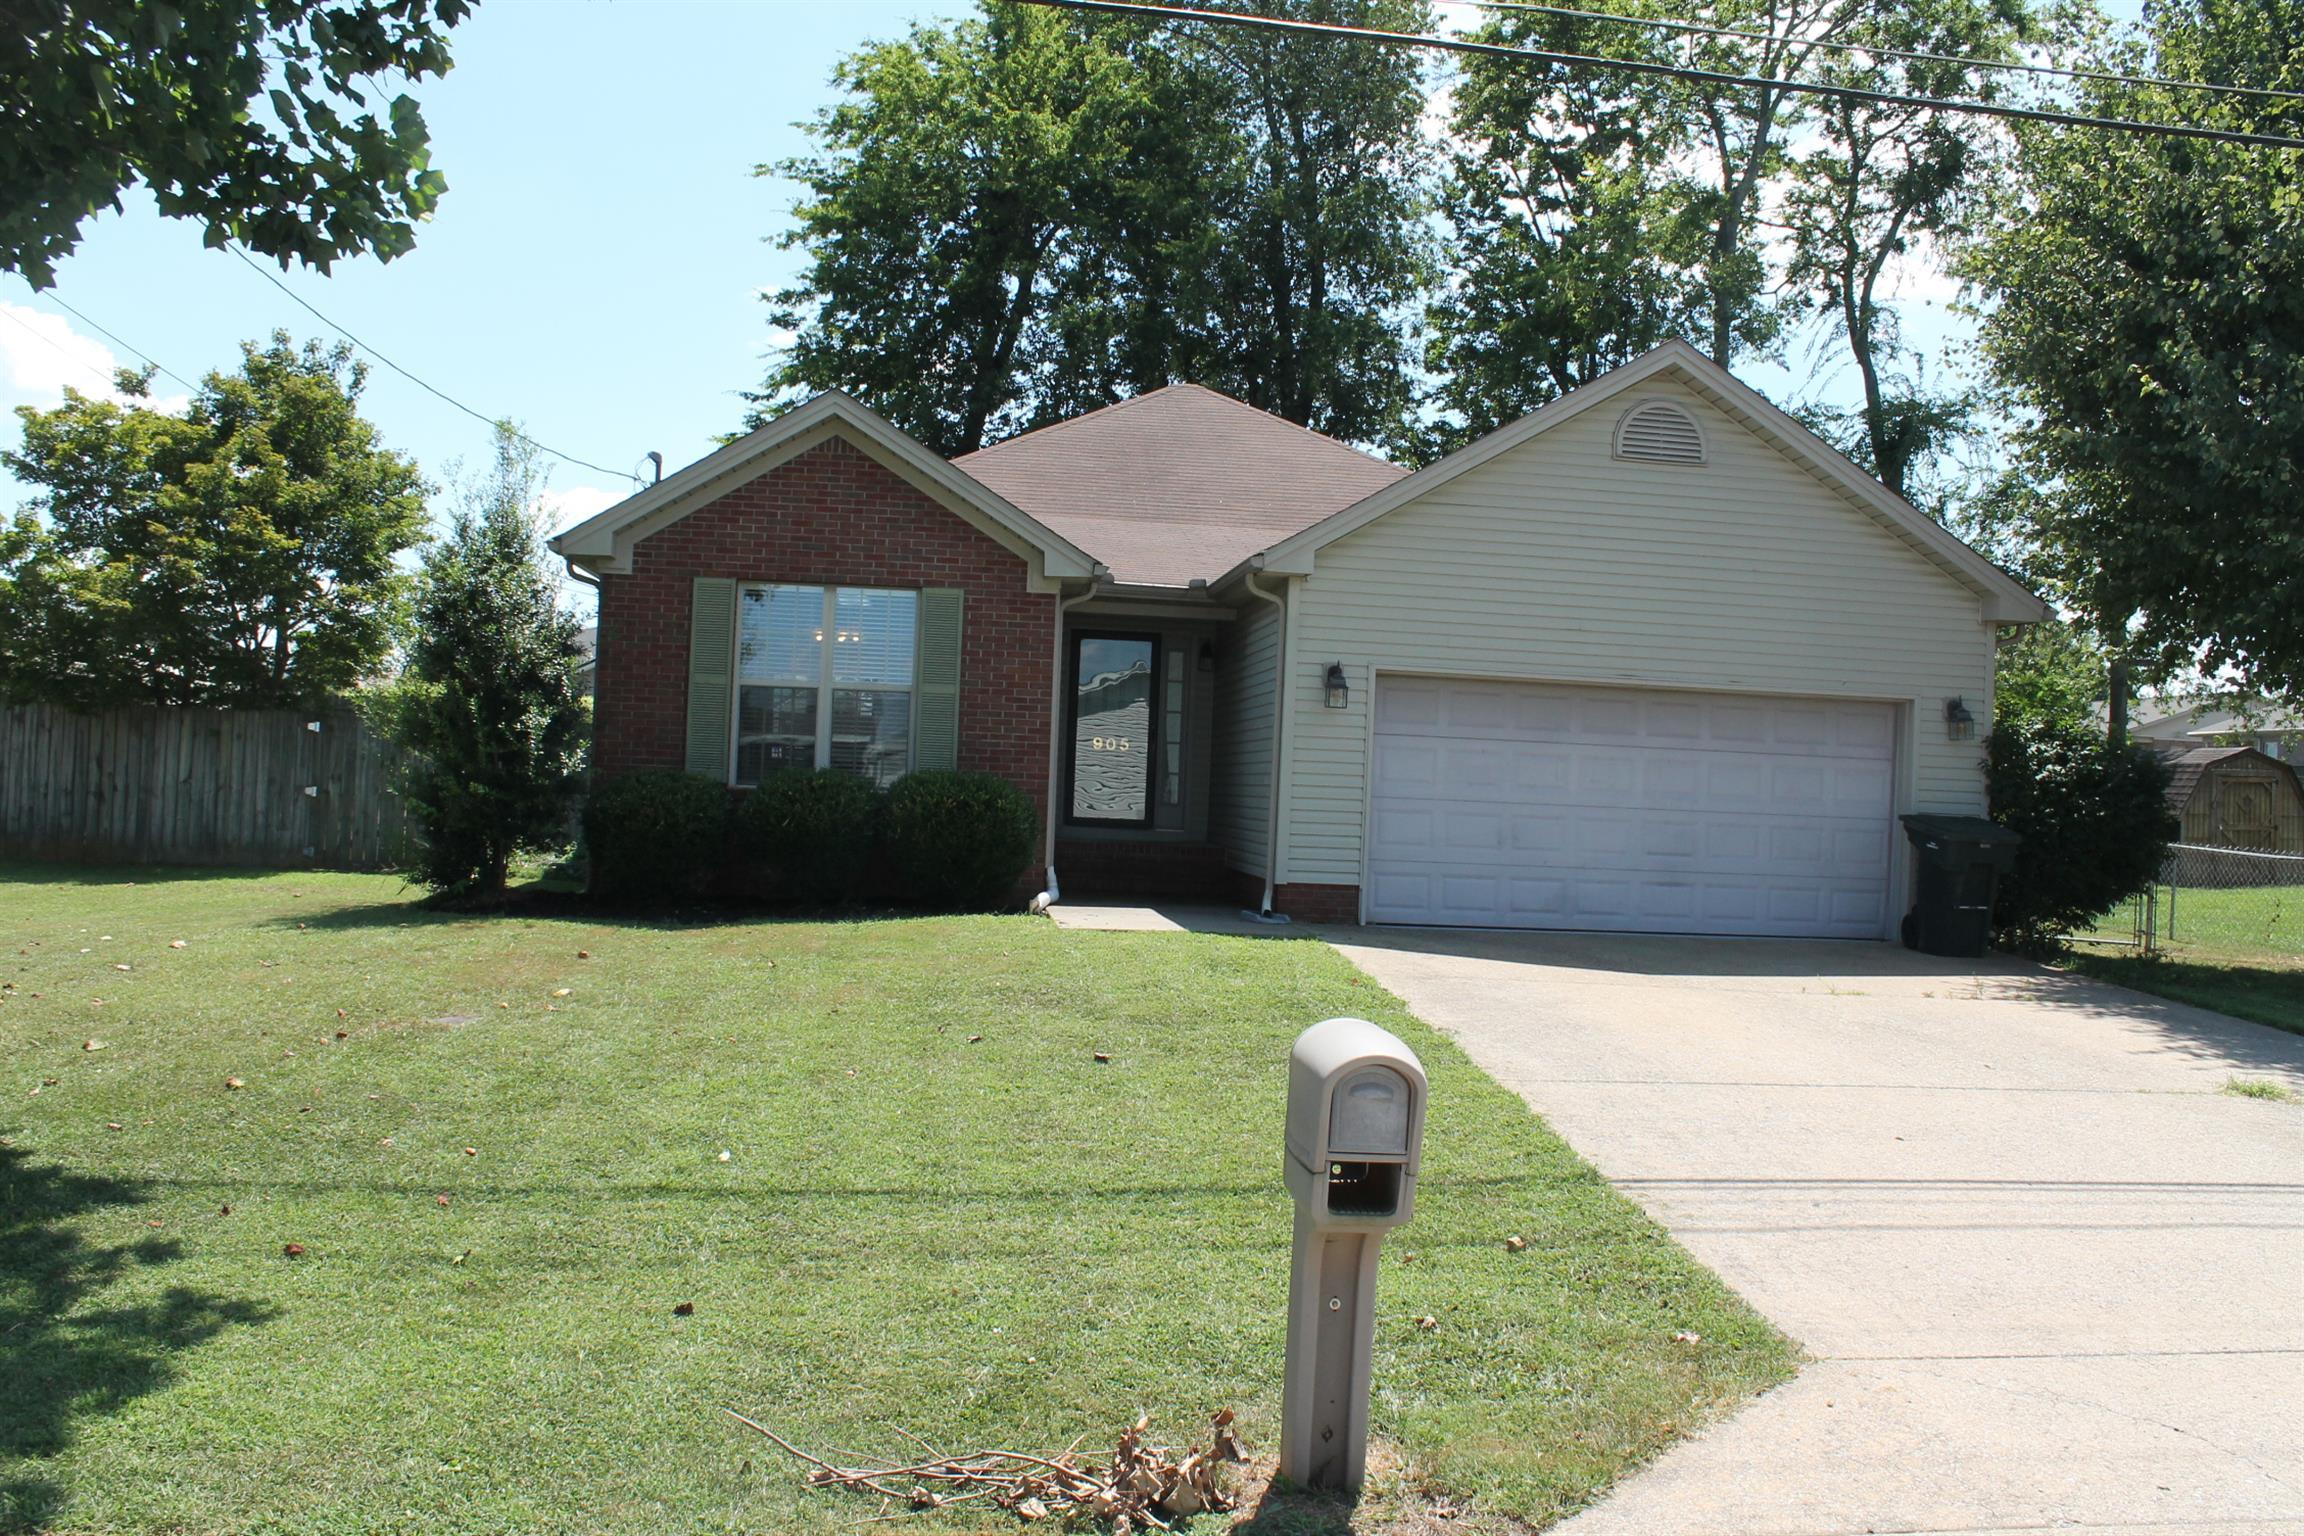 905 LC Avenue, Hopkinsville, KY 42240 - Hopkinsville, KY real estate listing